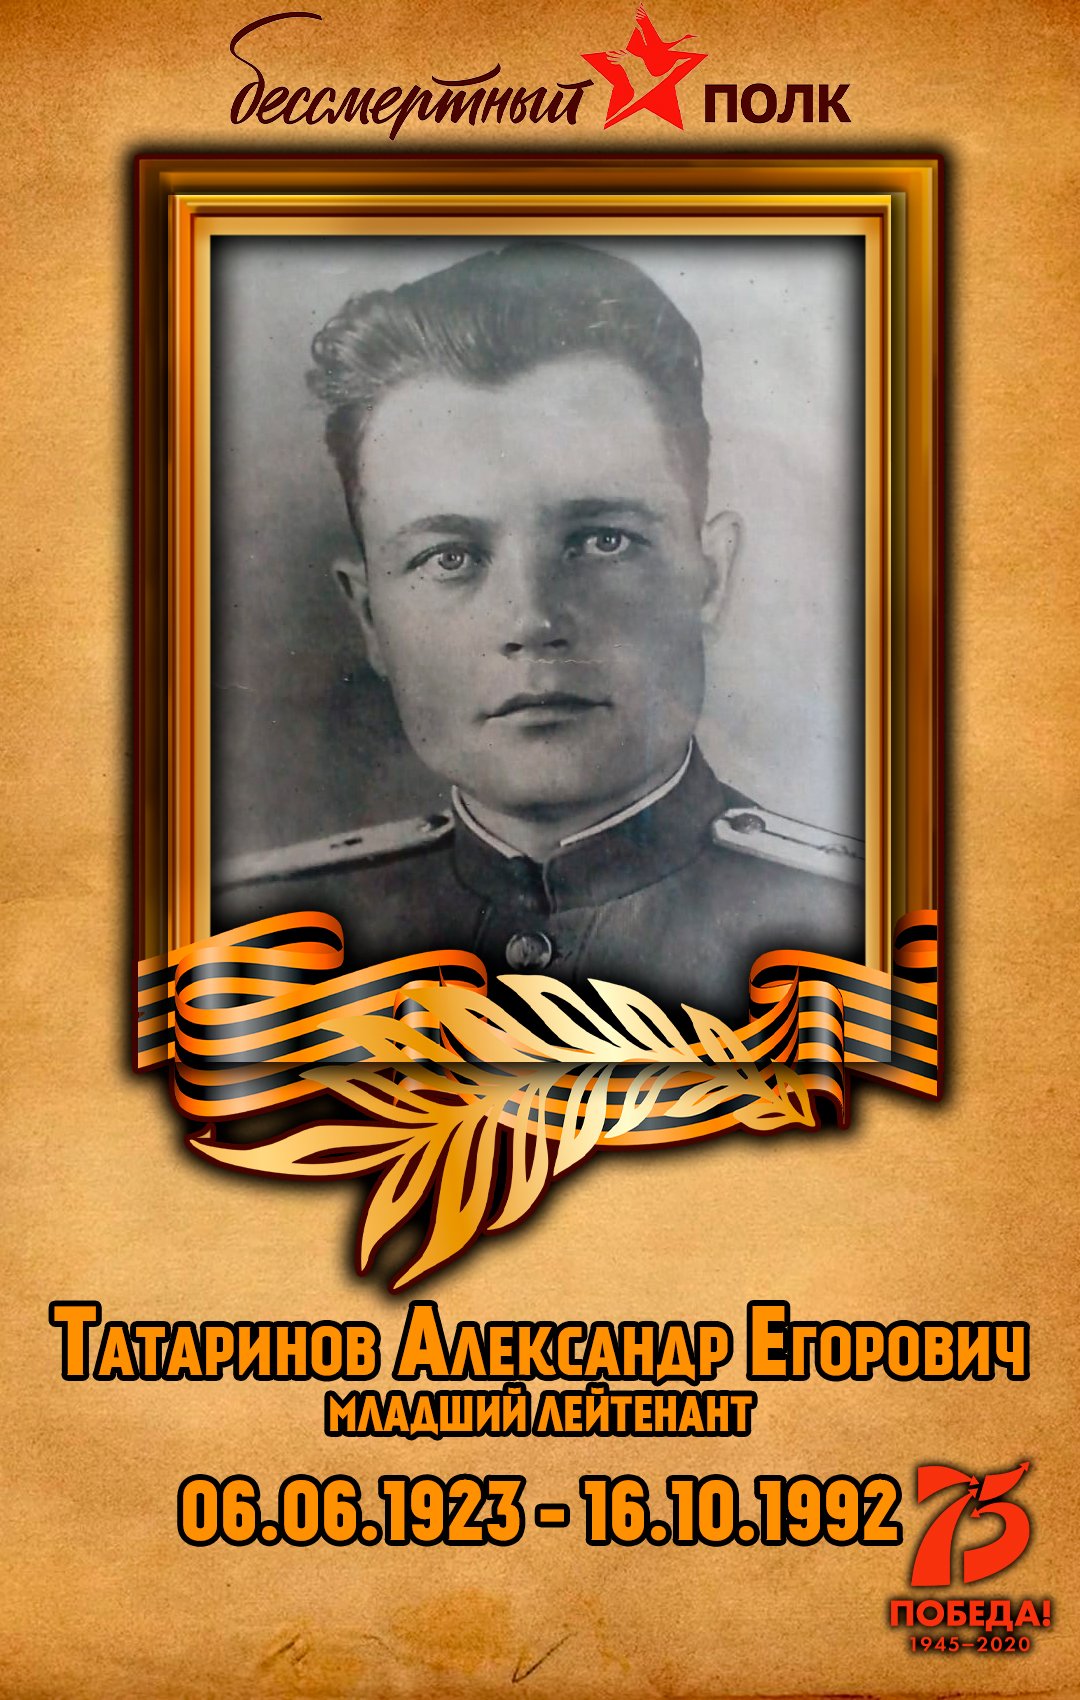 Татаринов-Александр-Егорович